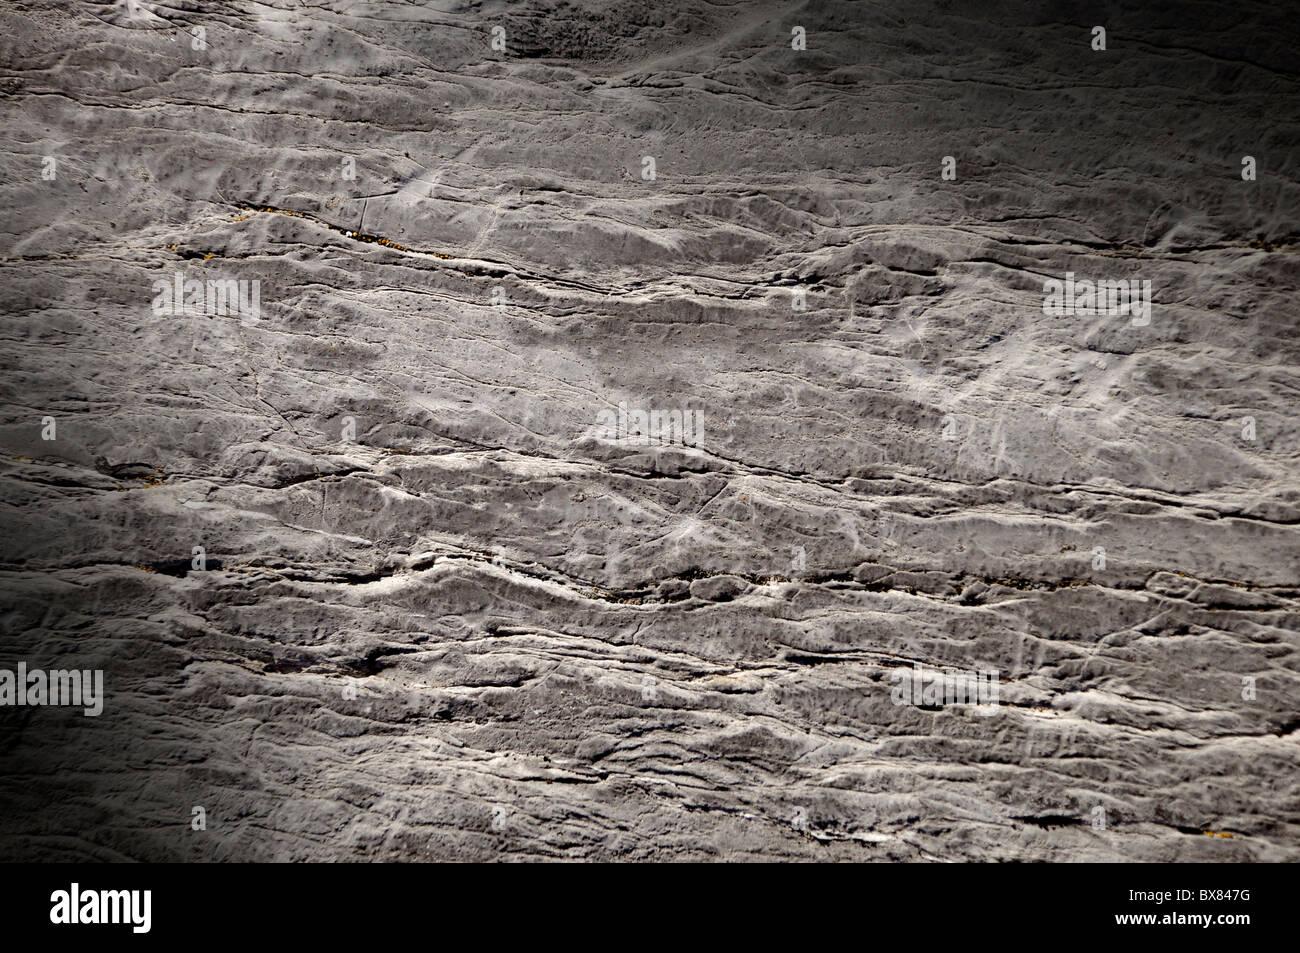 Roca agrietada la textura de la superficie iluminada en diagonal. Imagen De Stock